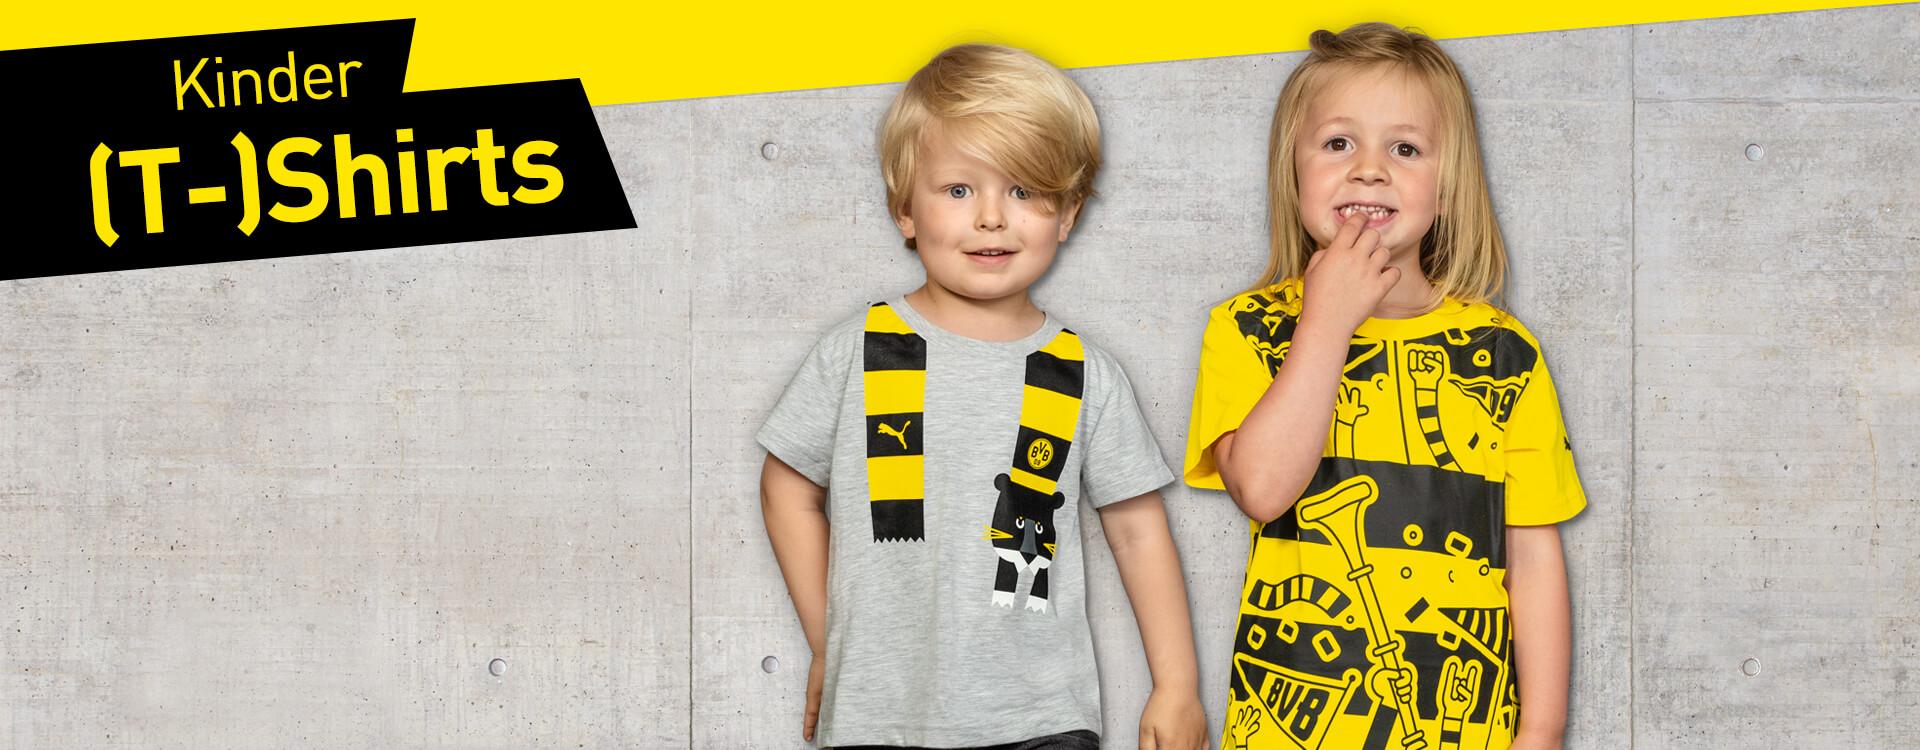 Onlineshop-Kategorieb-hnen-Desktop-1920x750px-Kinder_shirts